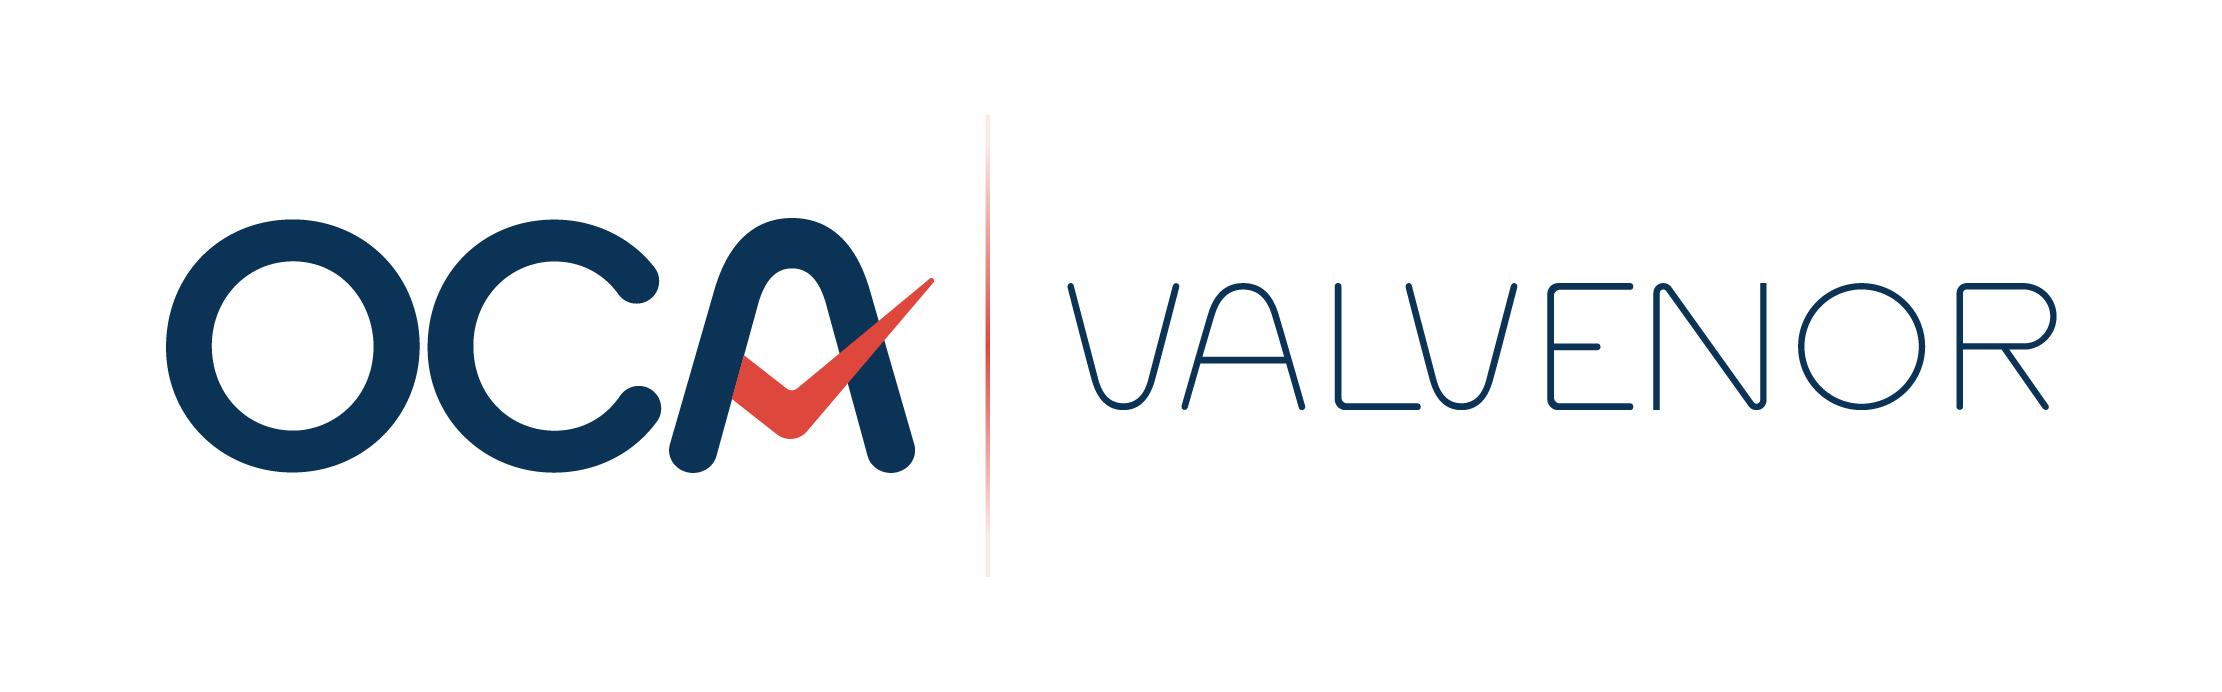 OCA Valvenor